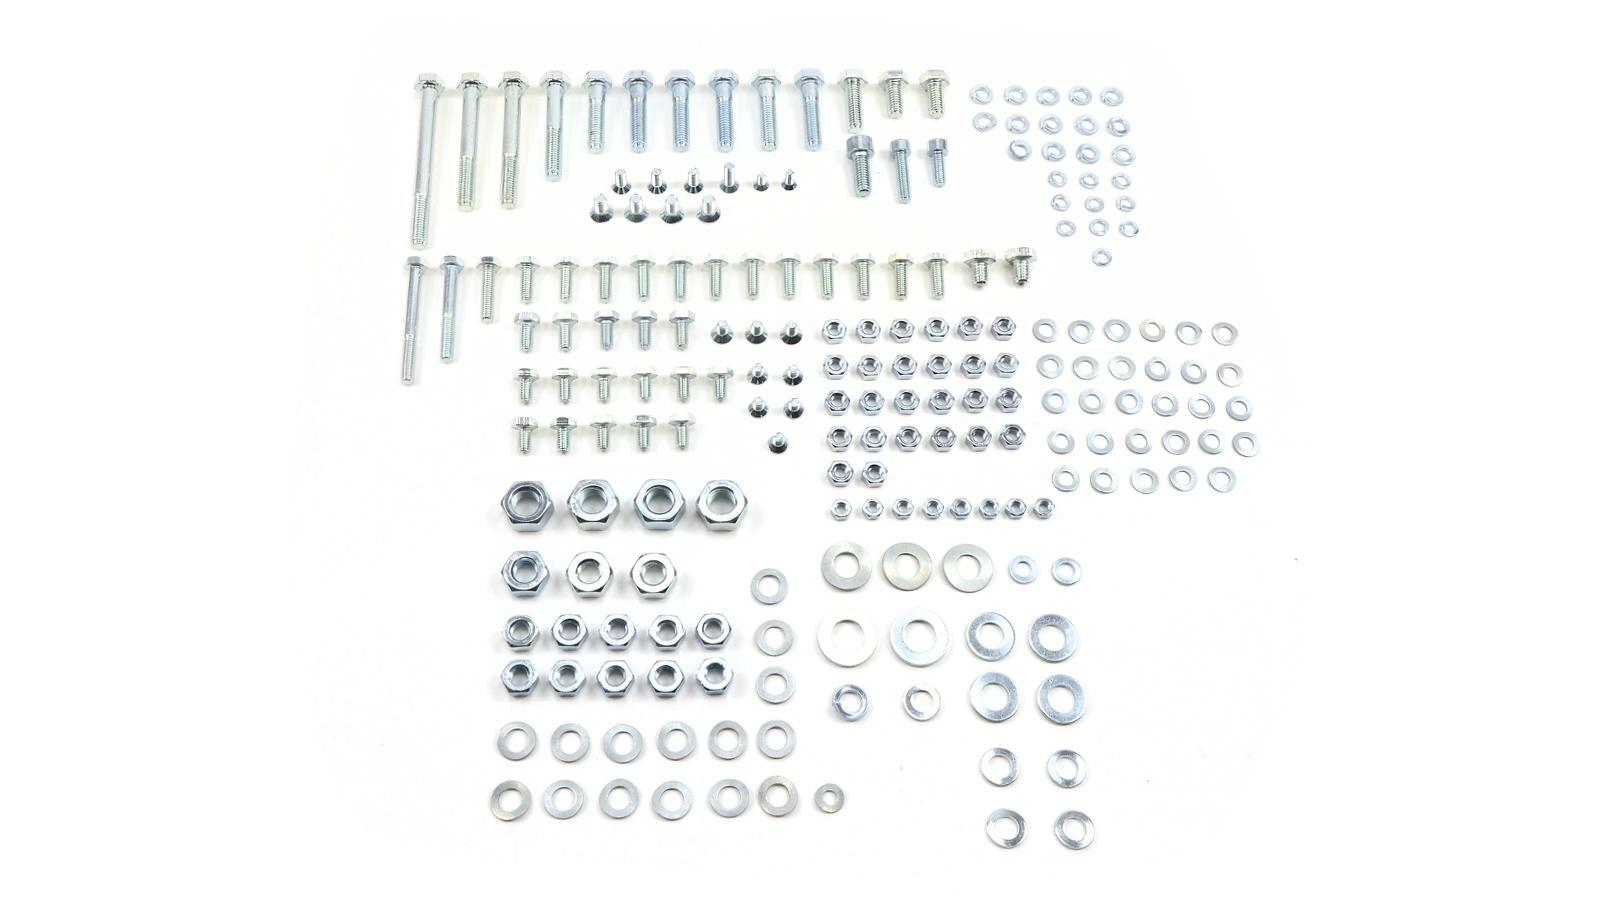 Normteile Satz für Rahmen (193 Teile) SR2, SR2E, 52,00 €